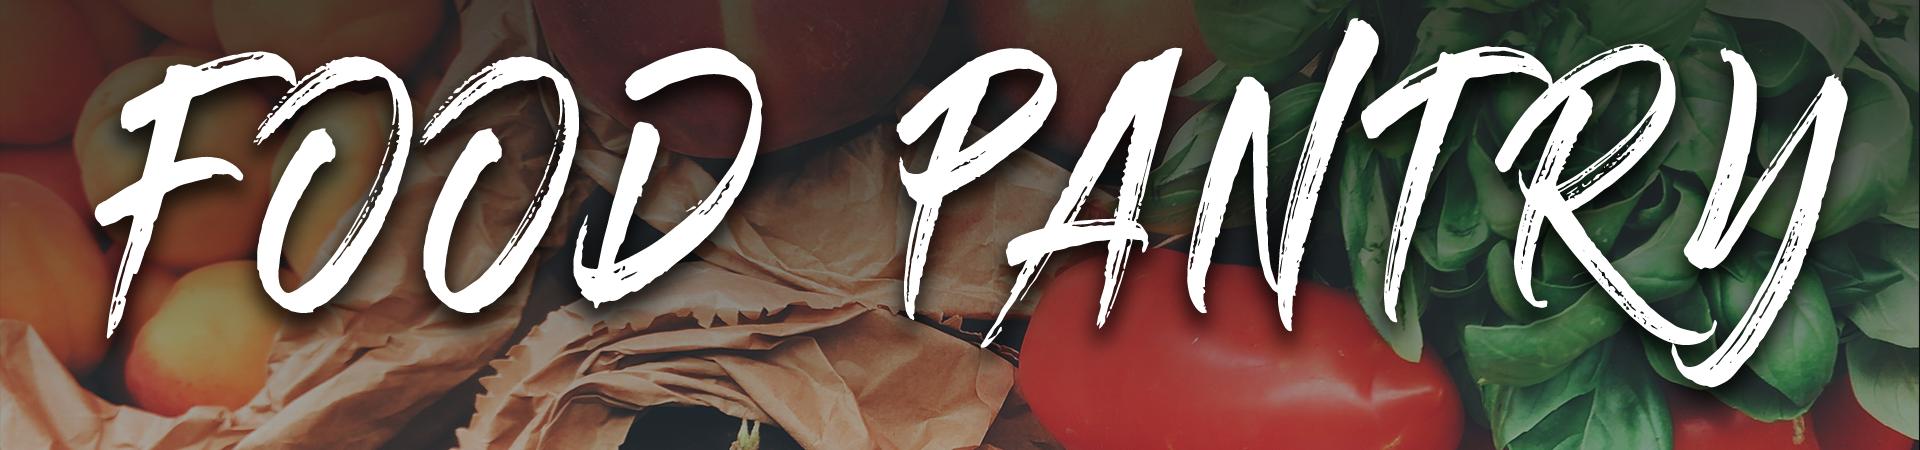 Food Pantry Bulletin banner.png